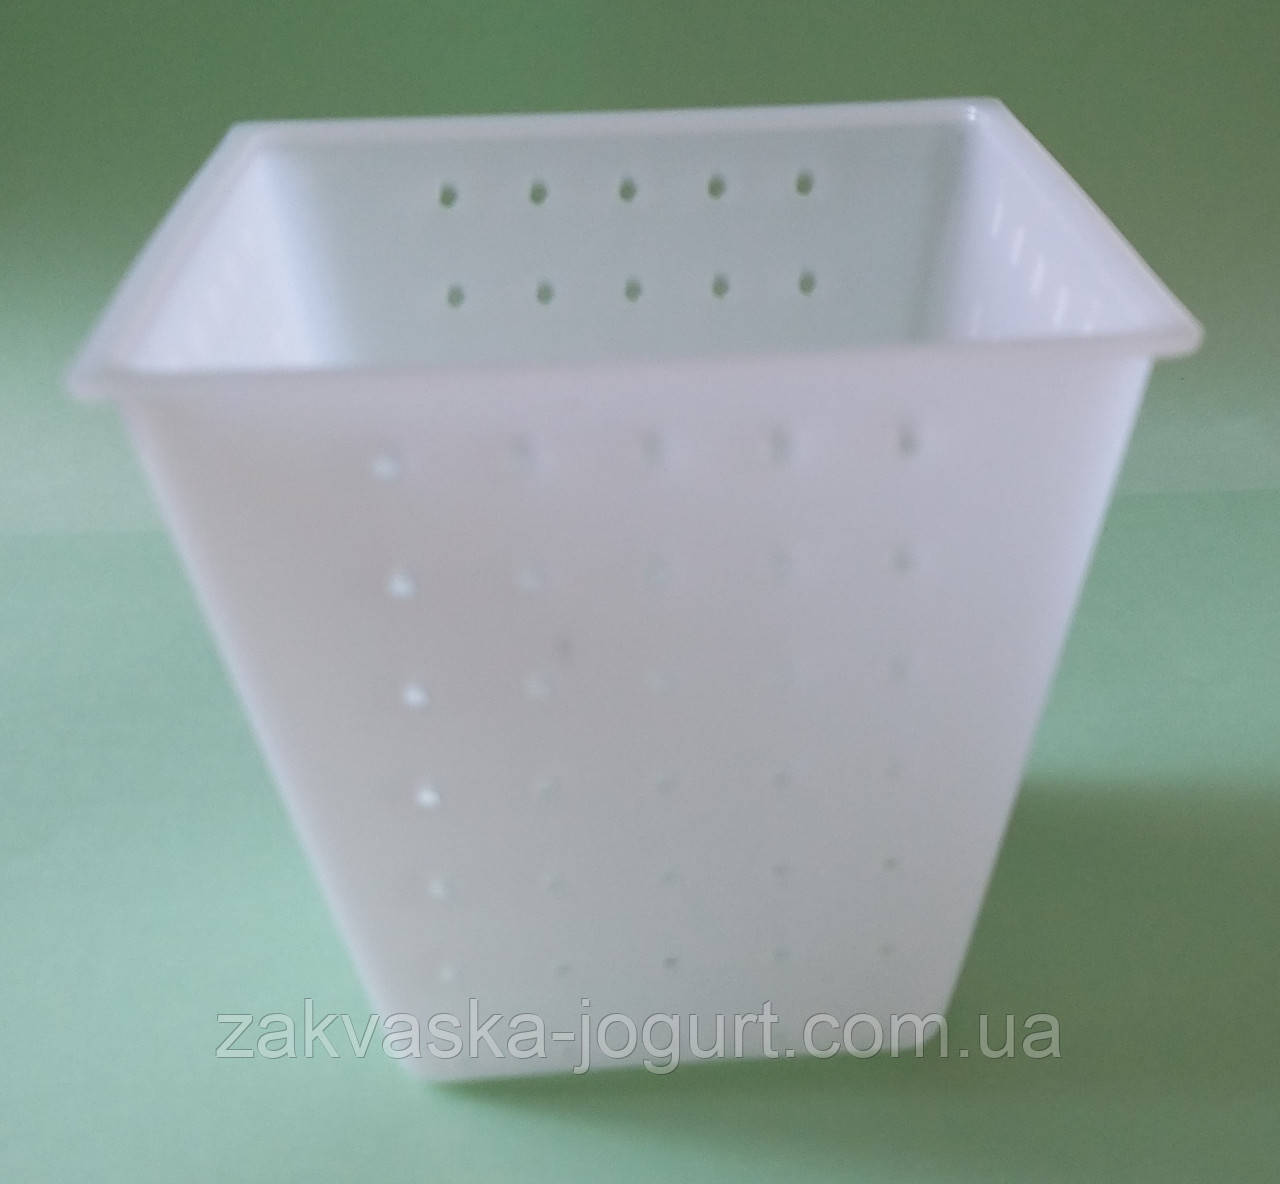 Форма для сыра Пирамидка 0,3-0,5 кг